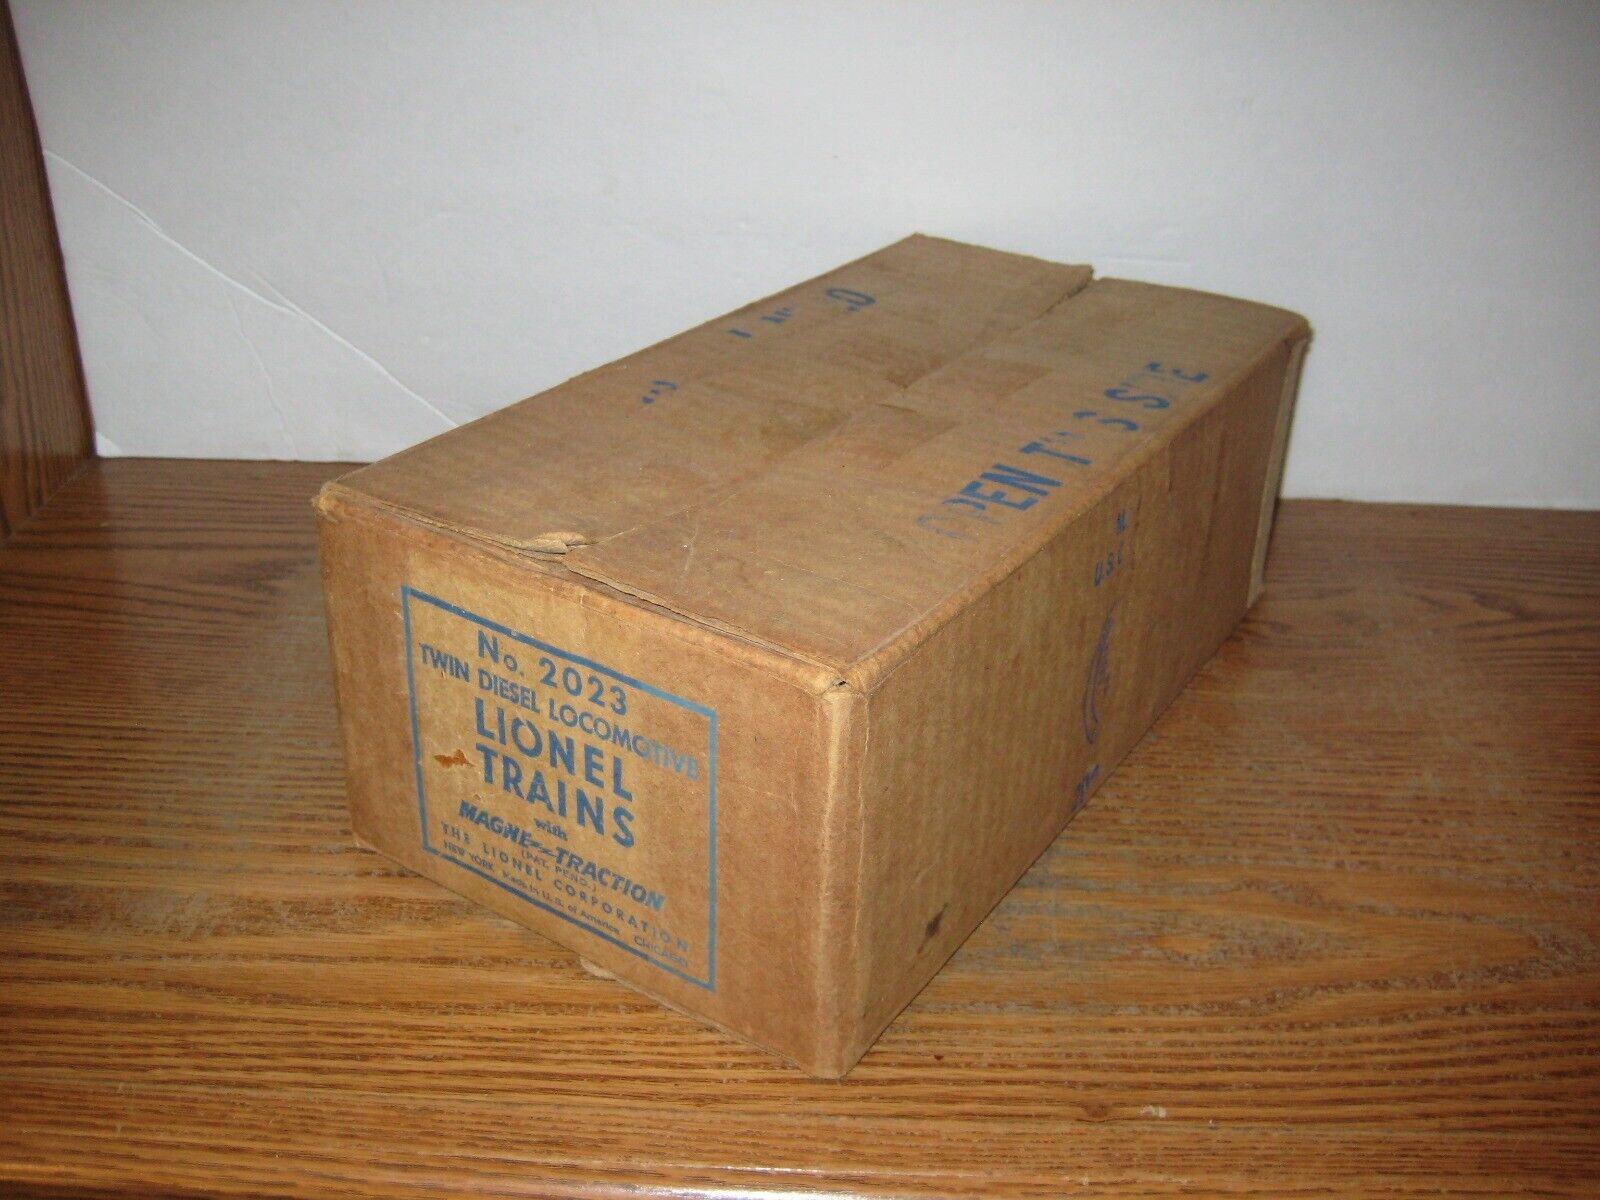 Lionel Postwar 2023 Alco Master Carton & Insert (65)